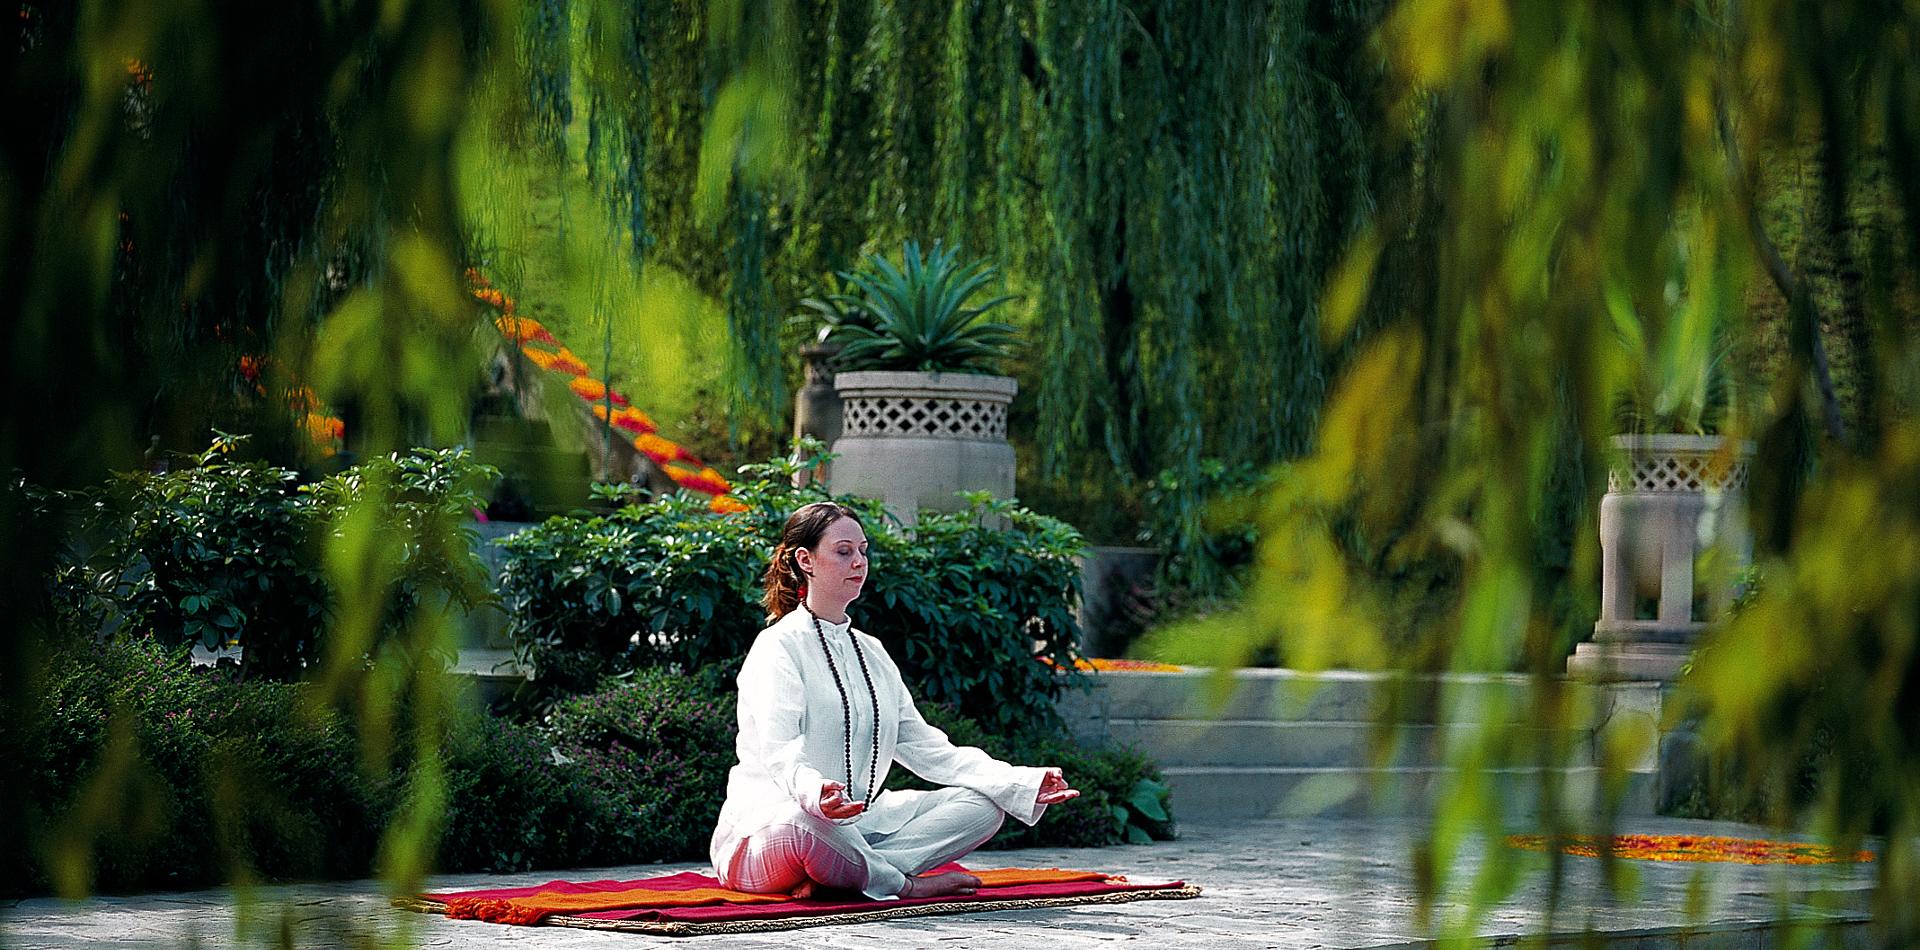 Ananda in the Himalayas, Wellness Ayurveda Yoga Meditation Hotel Indien, Wellnessreise Indien